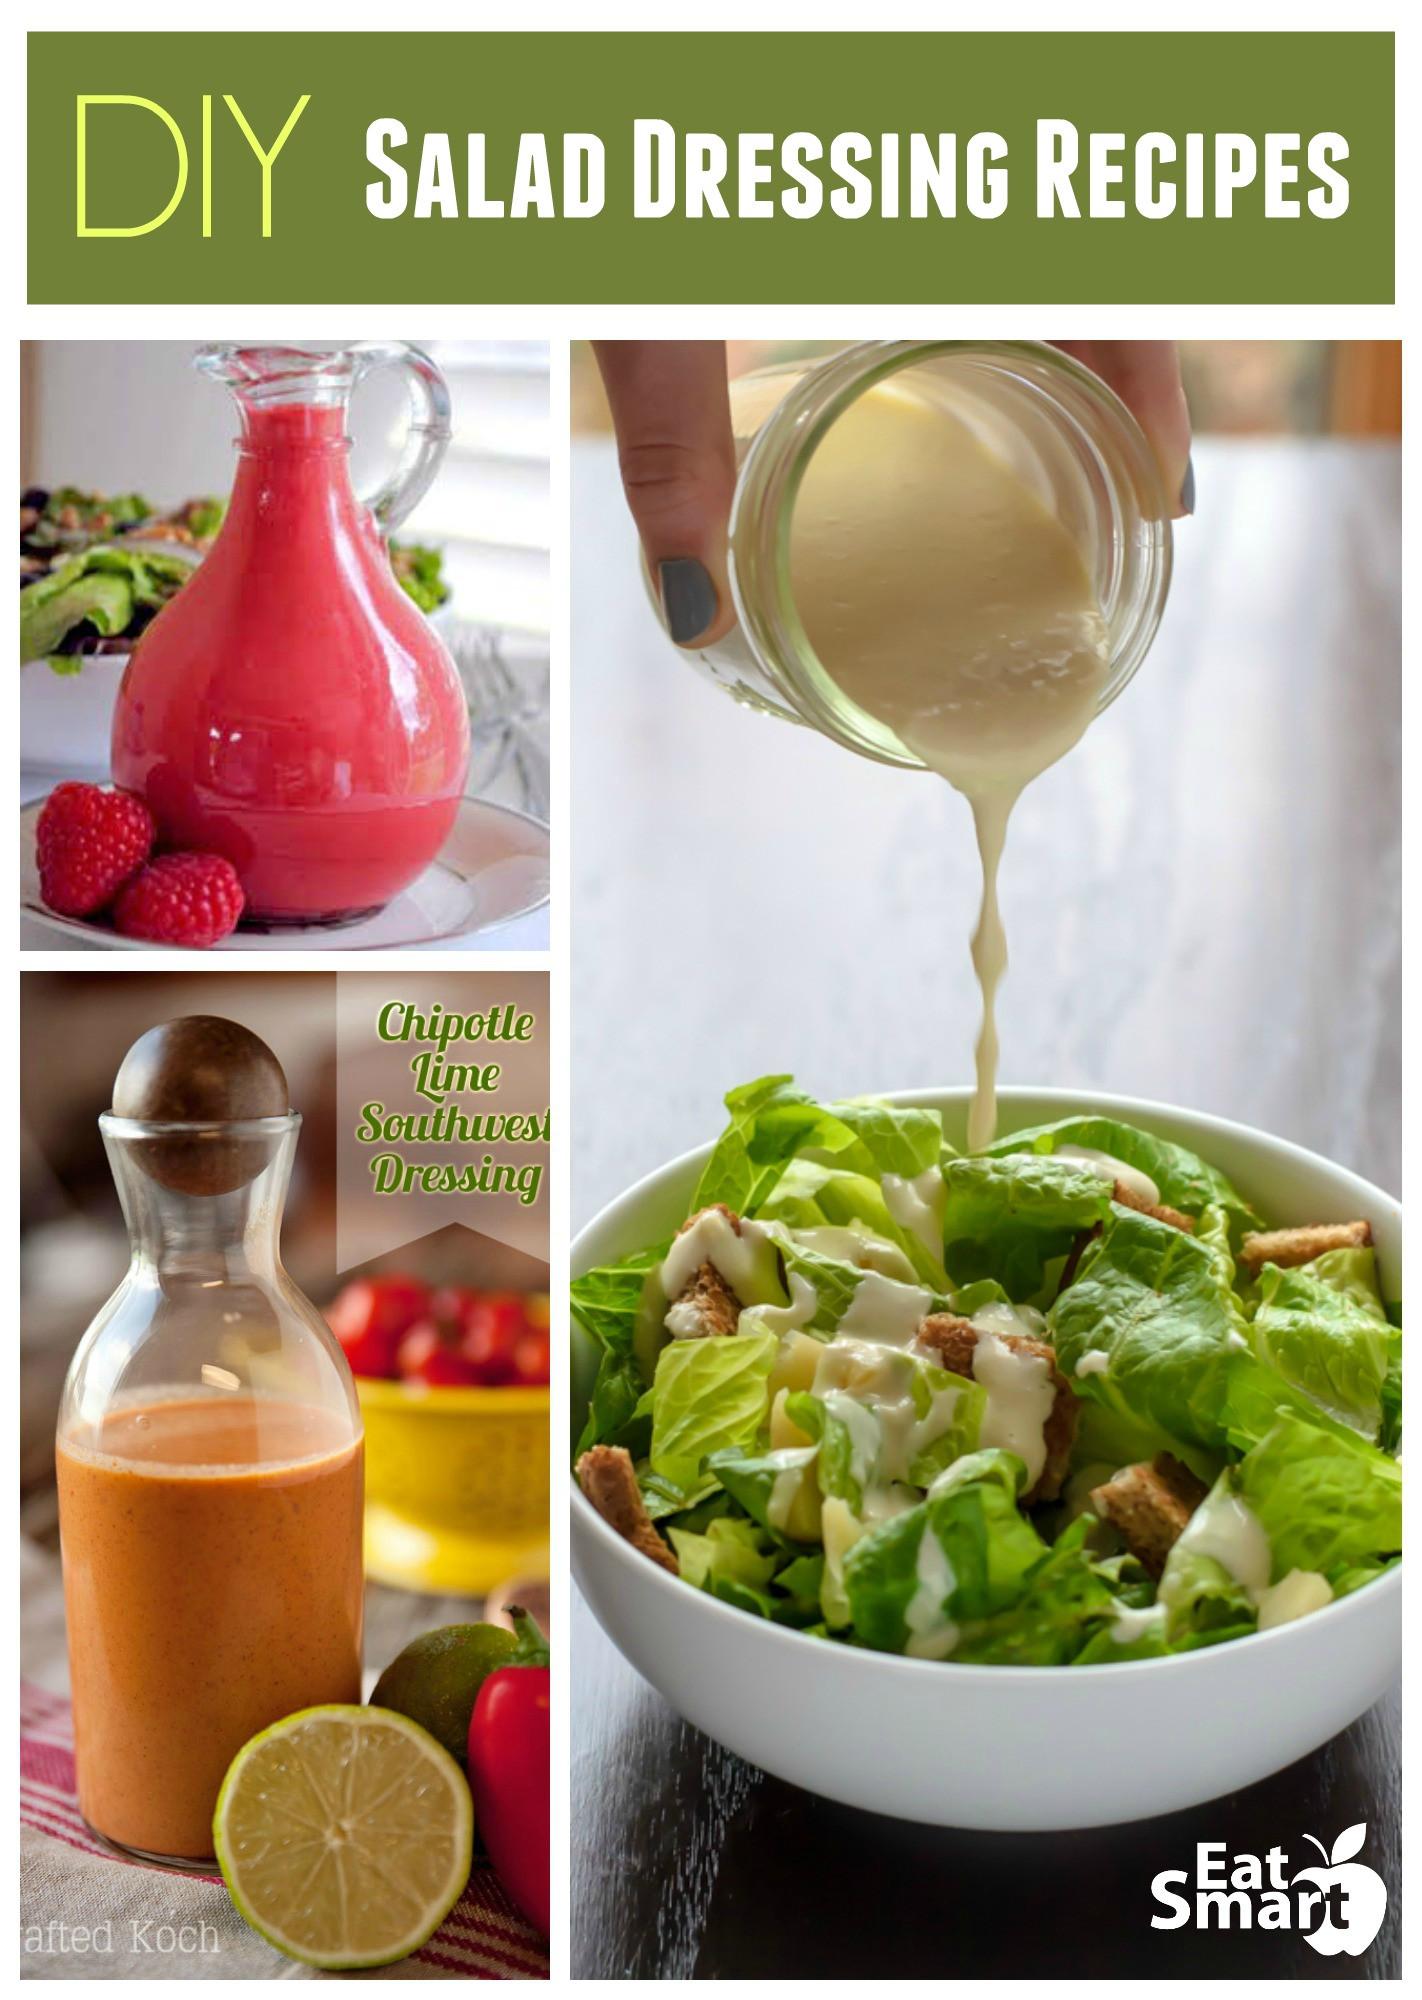 Recipes For Healthy Salad Dressings  DIY Salad Dressing Recipe Roundup – The EatSmart Blog